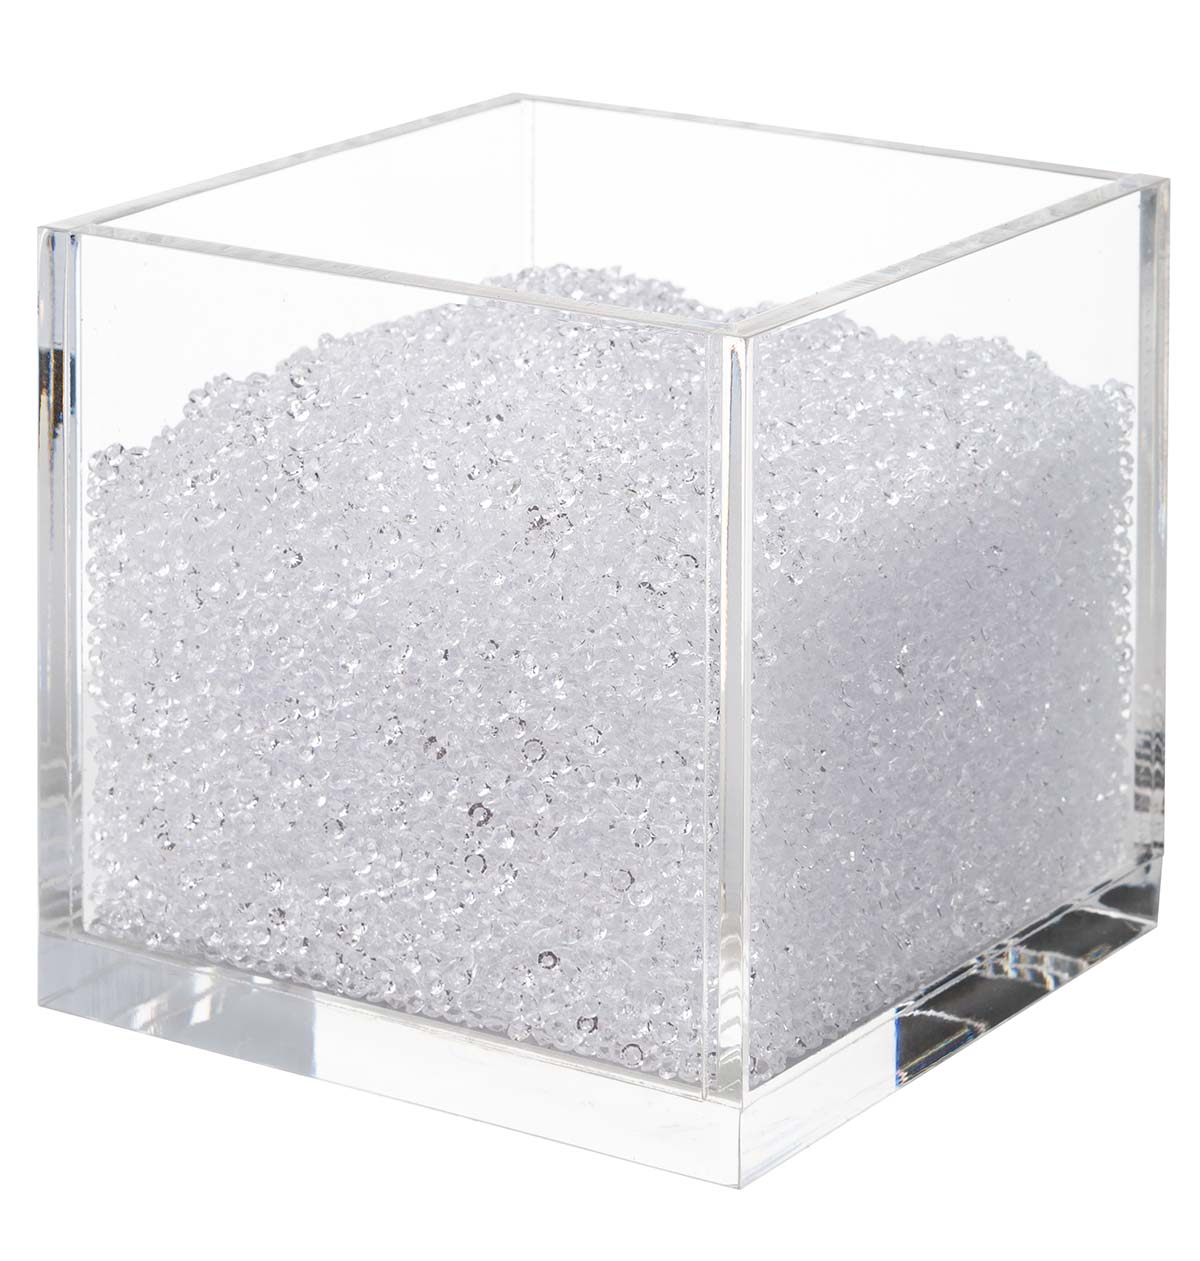 Acrylic Cube Organizer With Crystals